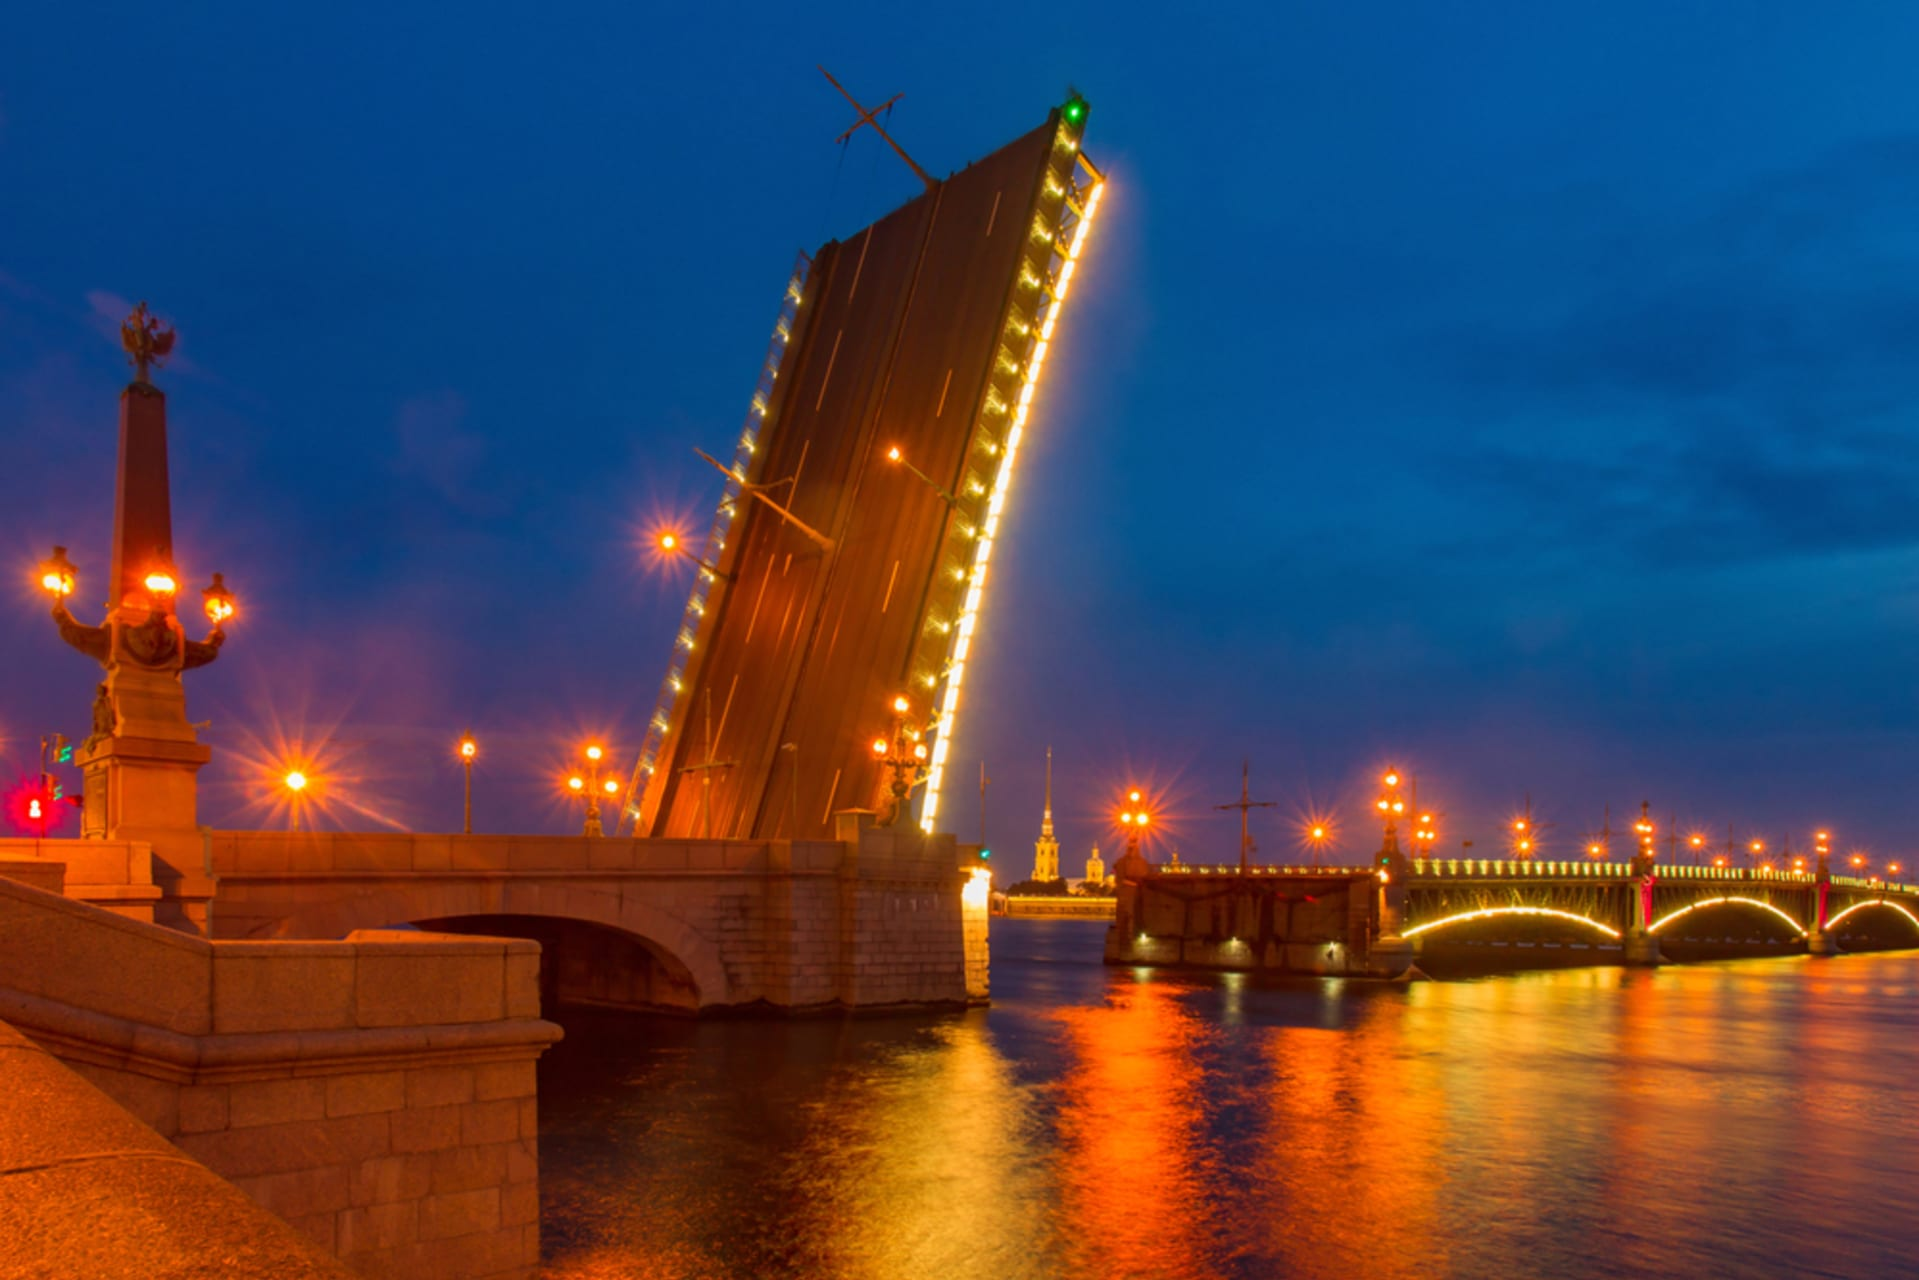 Saint Petersburg - White Nights Special Part 4. Trinity Bridge Opening